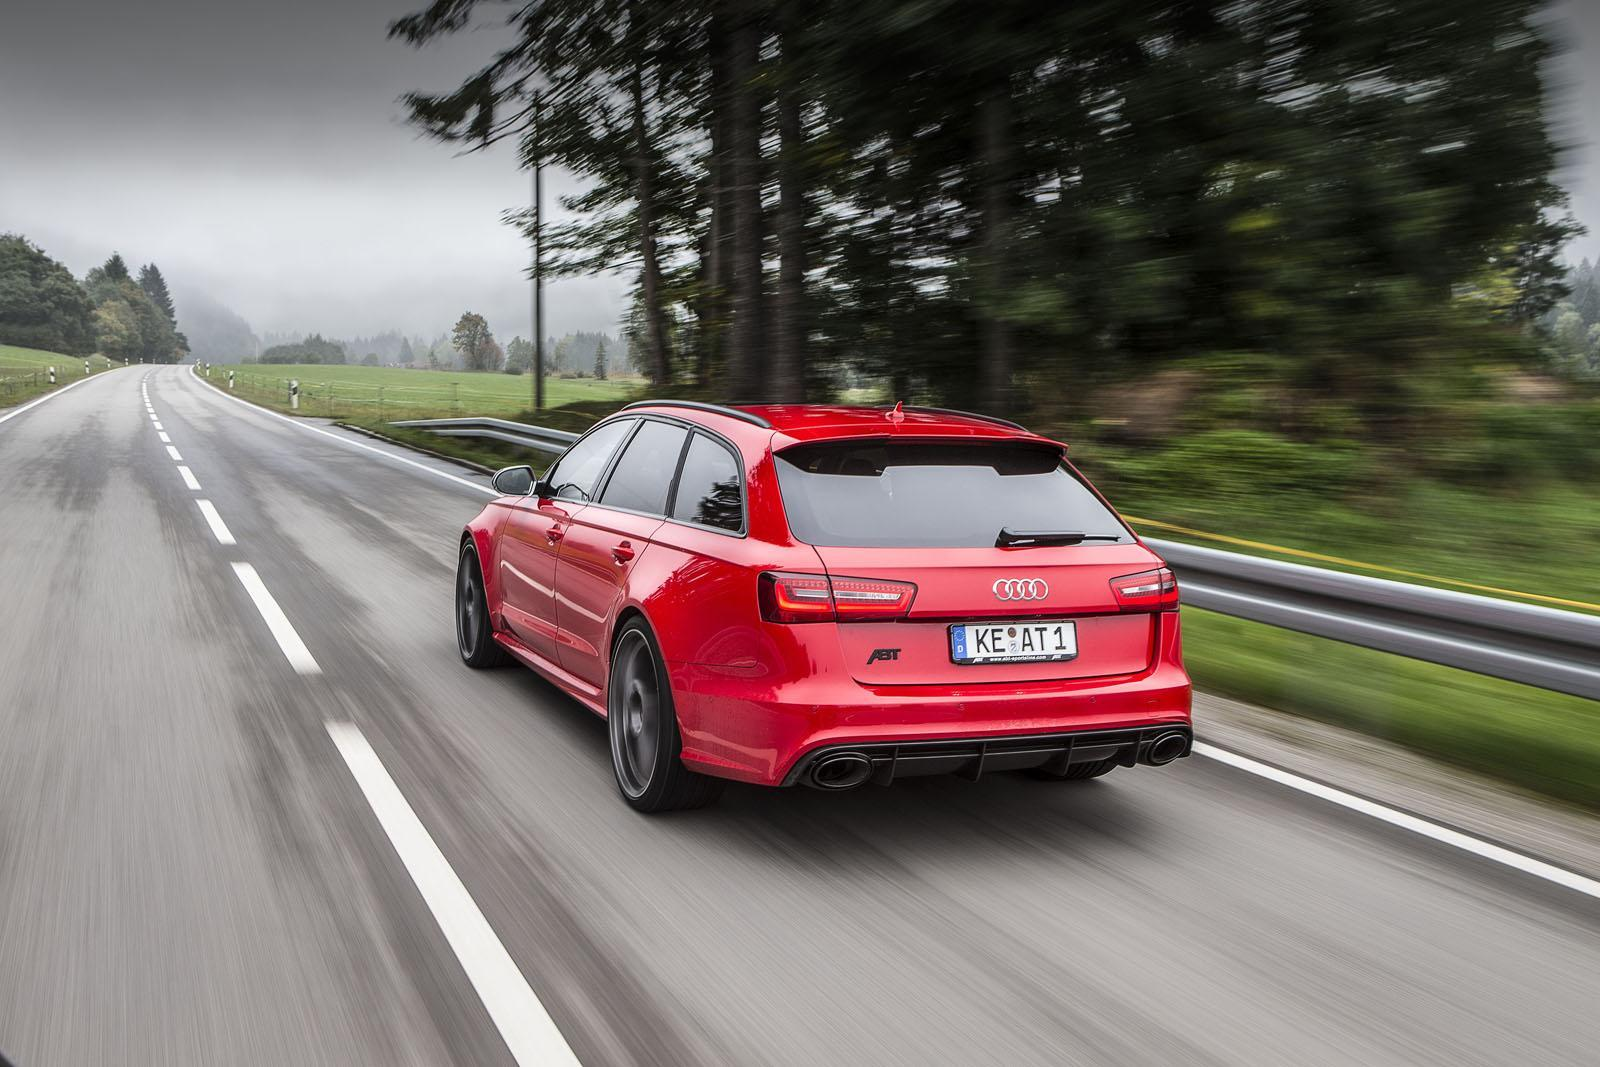 Abt Audi Rs6 Avant 1 12